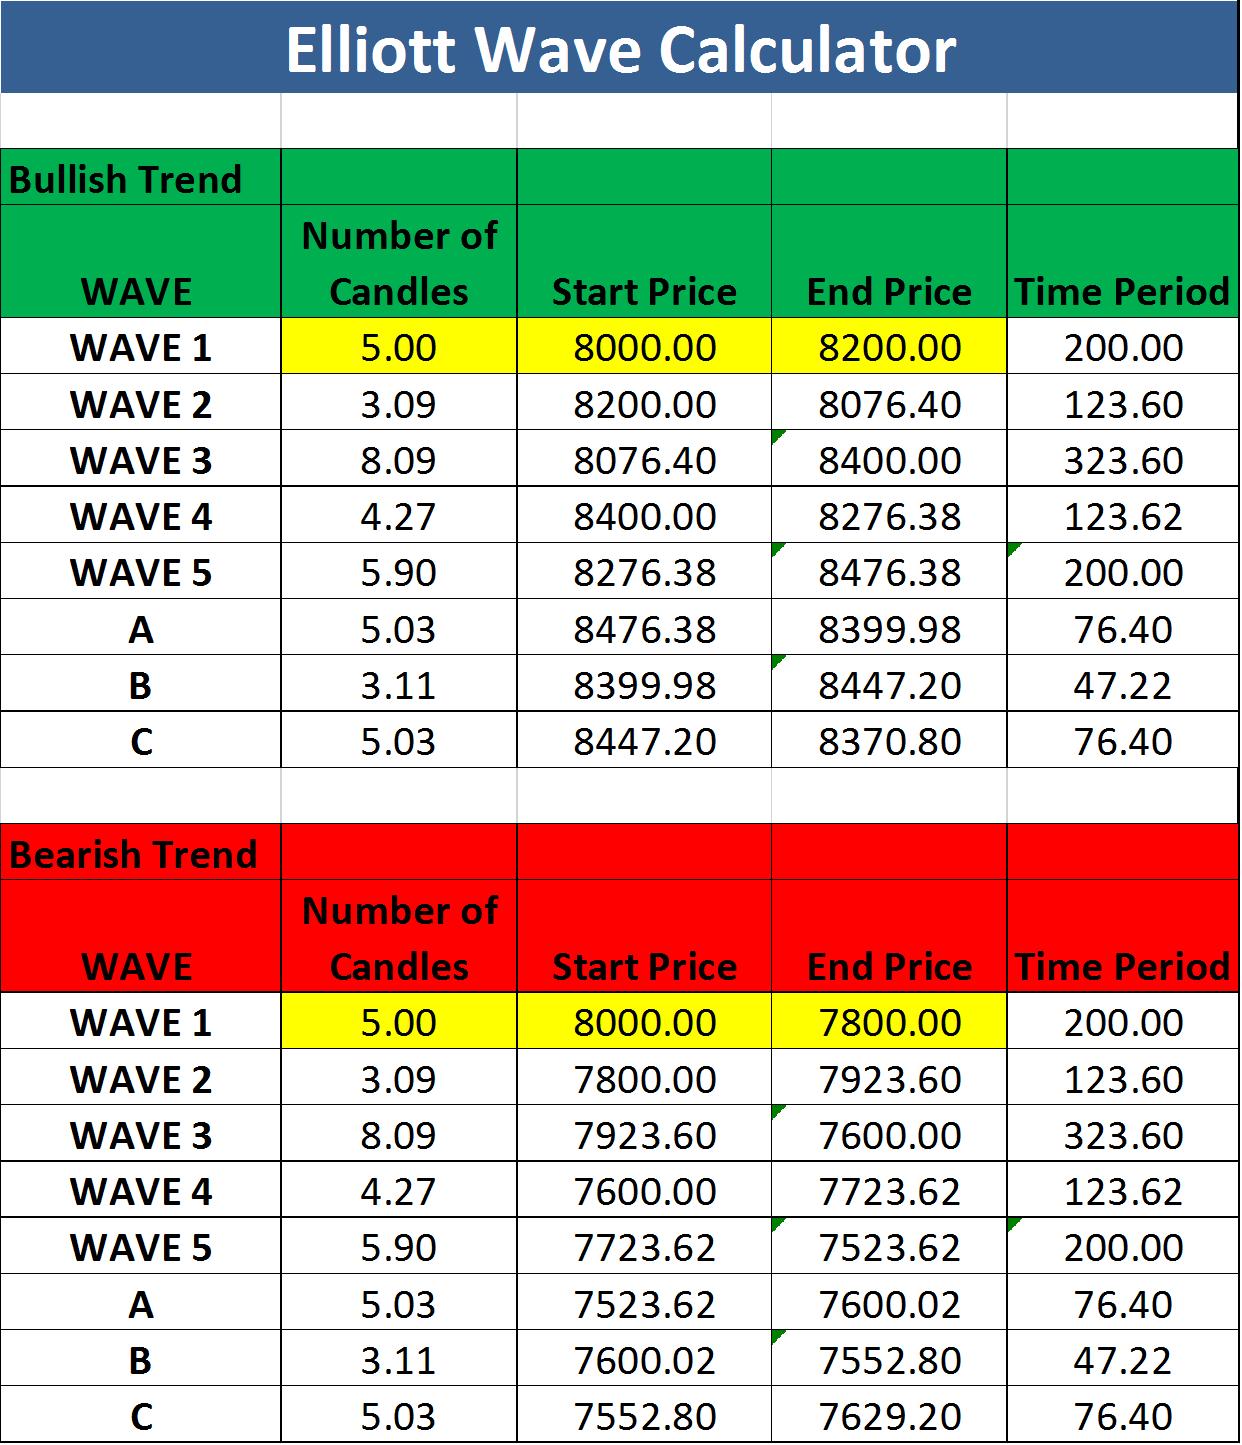 Elliott Waveysis Excel Sheet Free Download